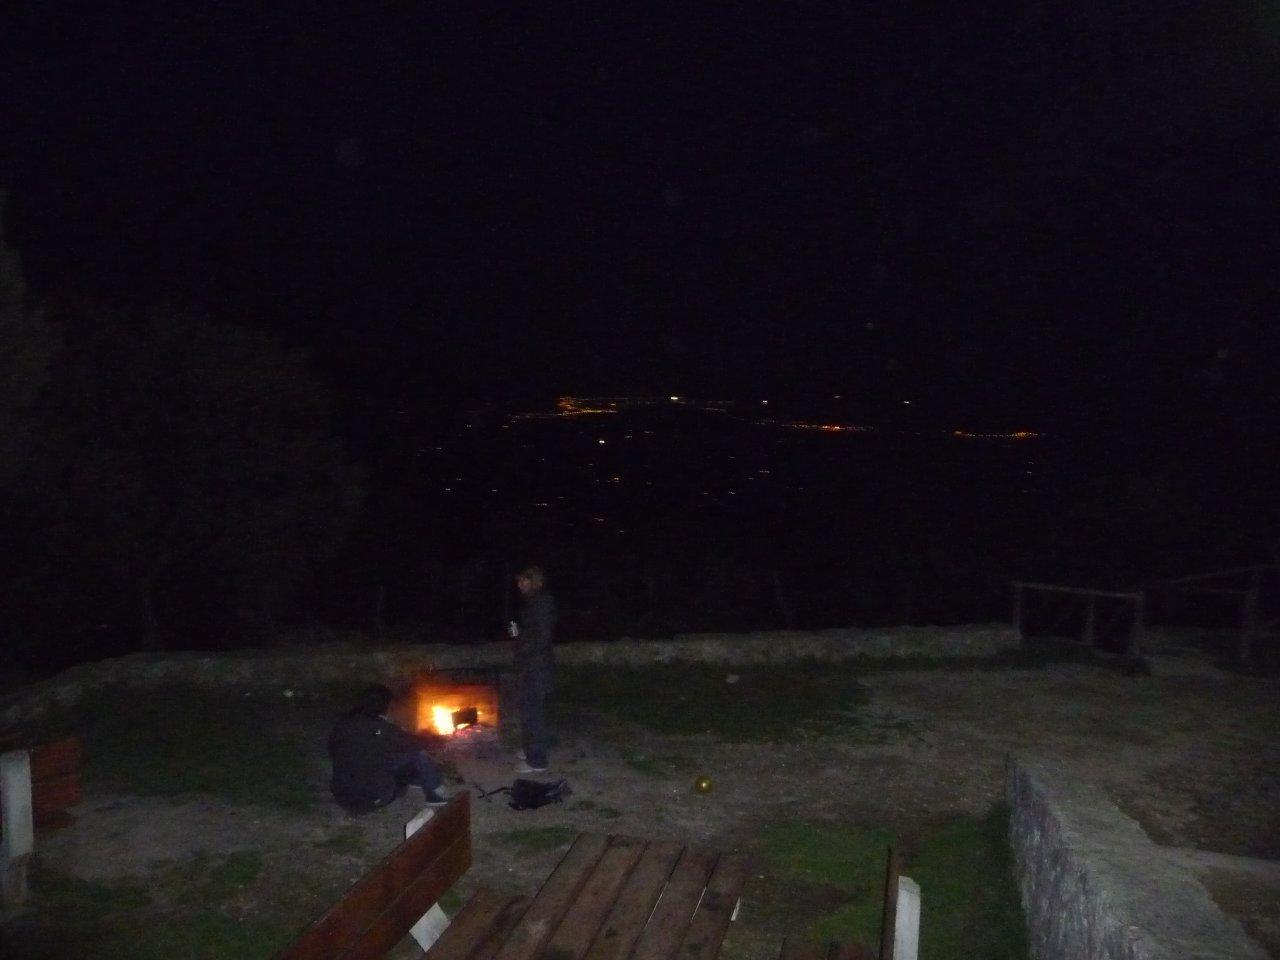 monastry puig maria night barbeque